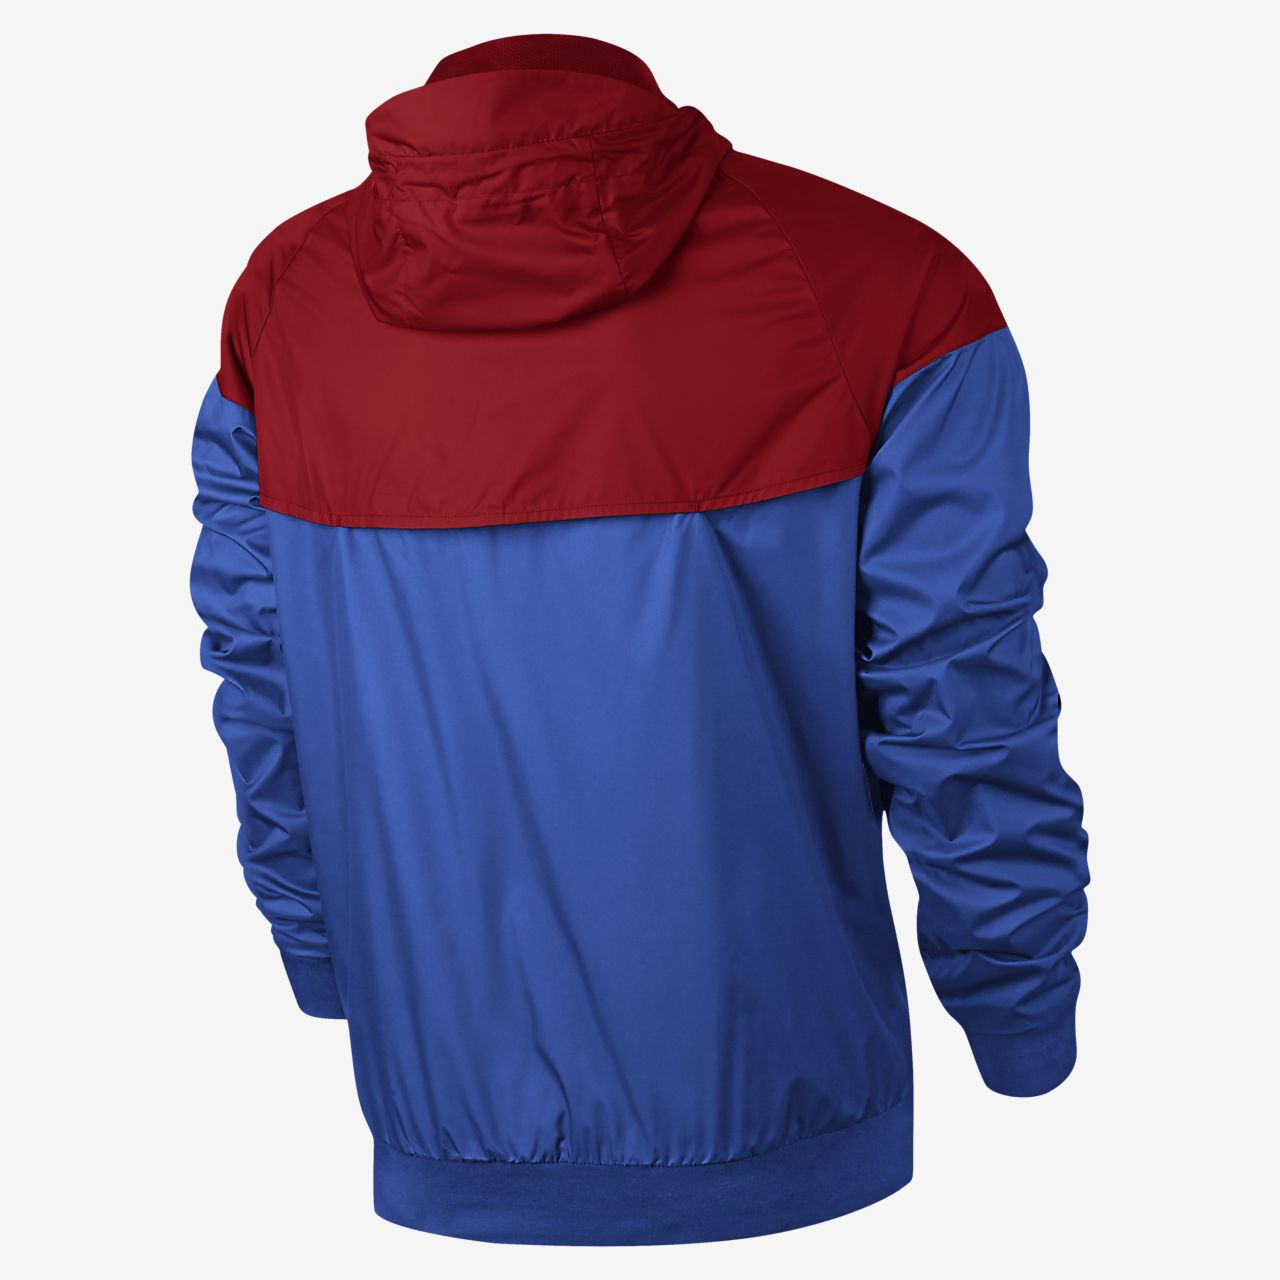 ... Paris Saint-Germain Authentic Windrunner Men's Jacket